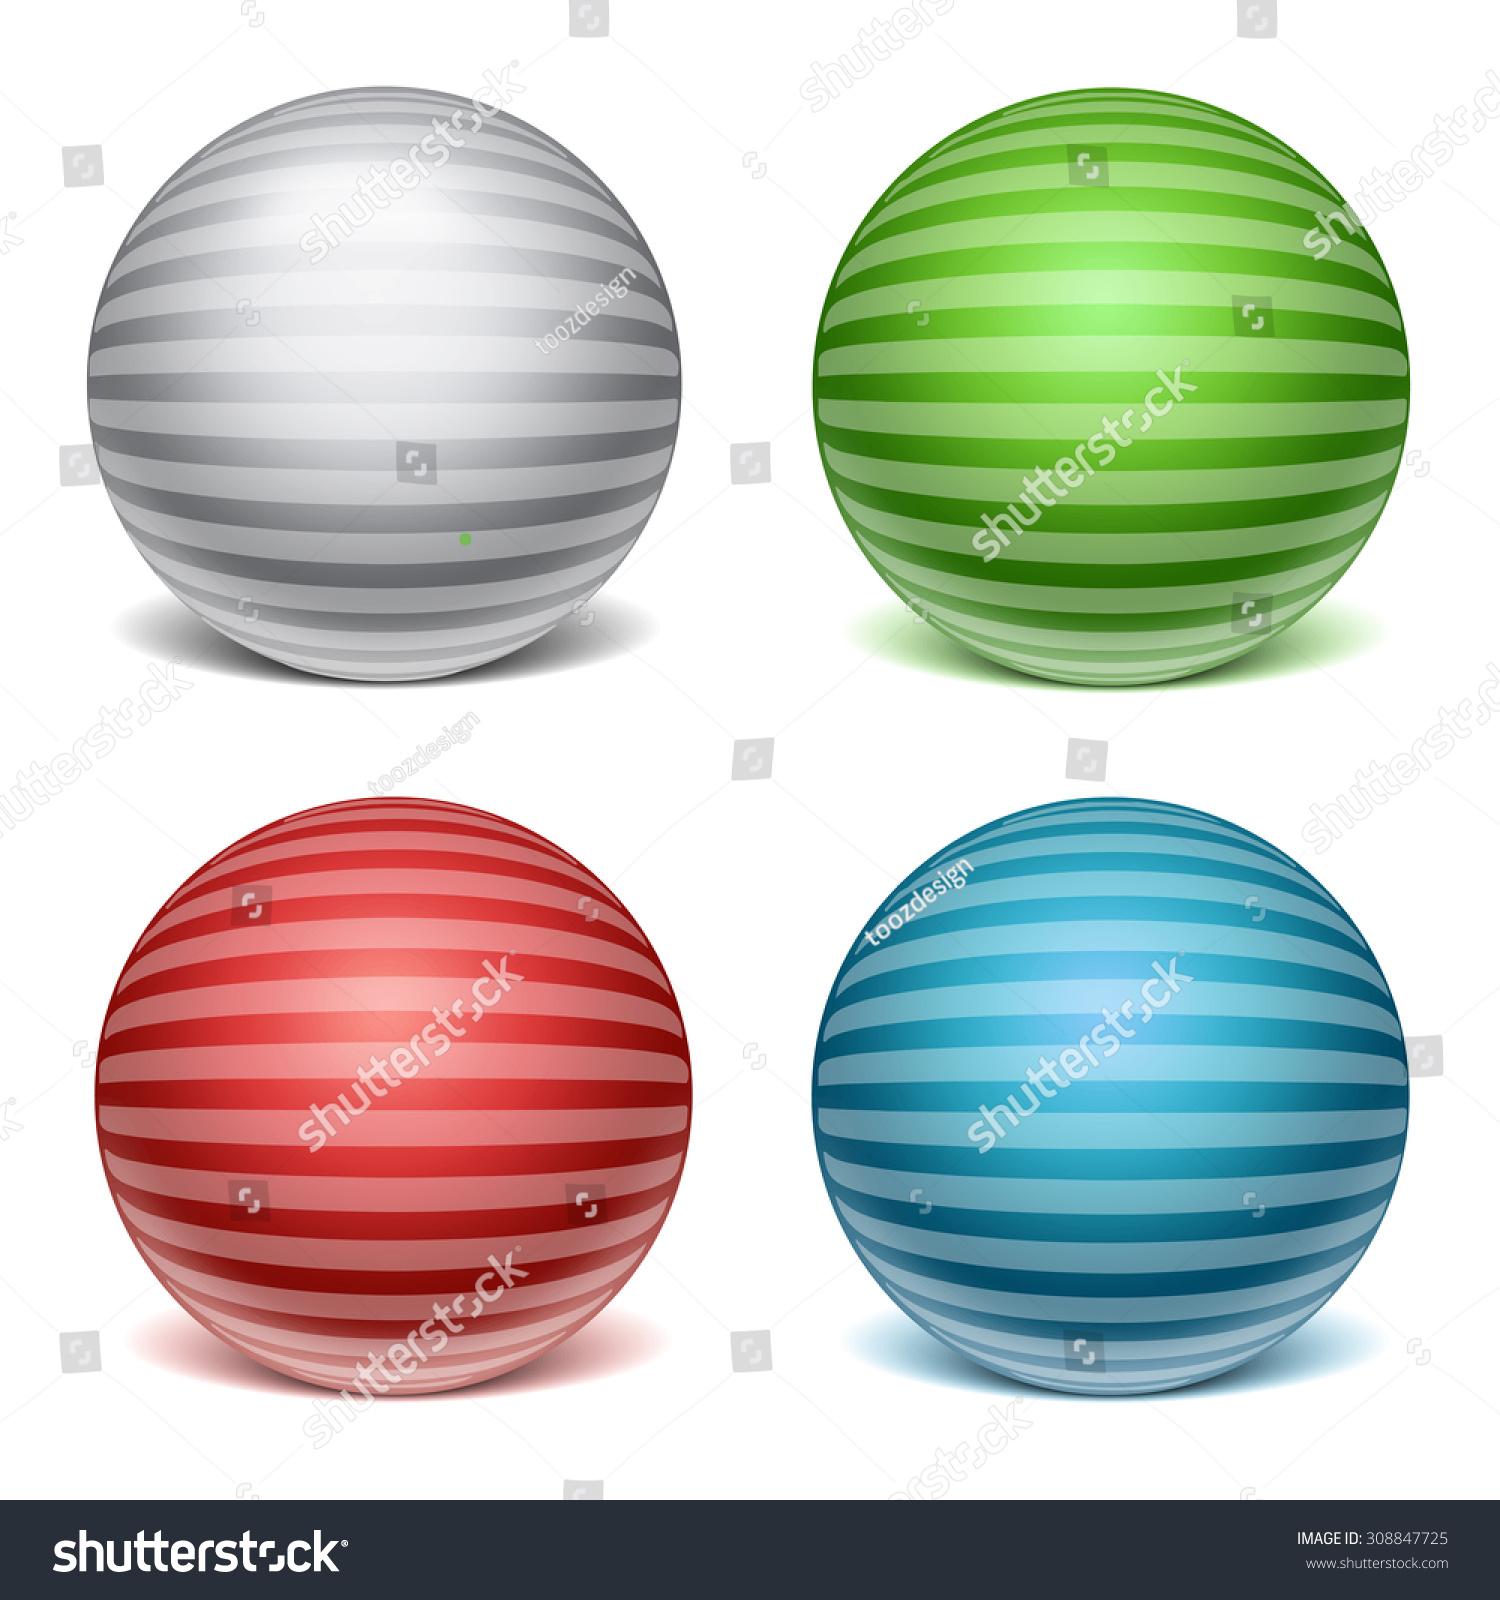 sphere net template - sphere glass template image vectorielle 308847725